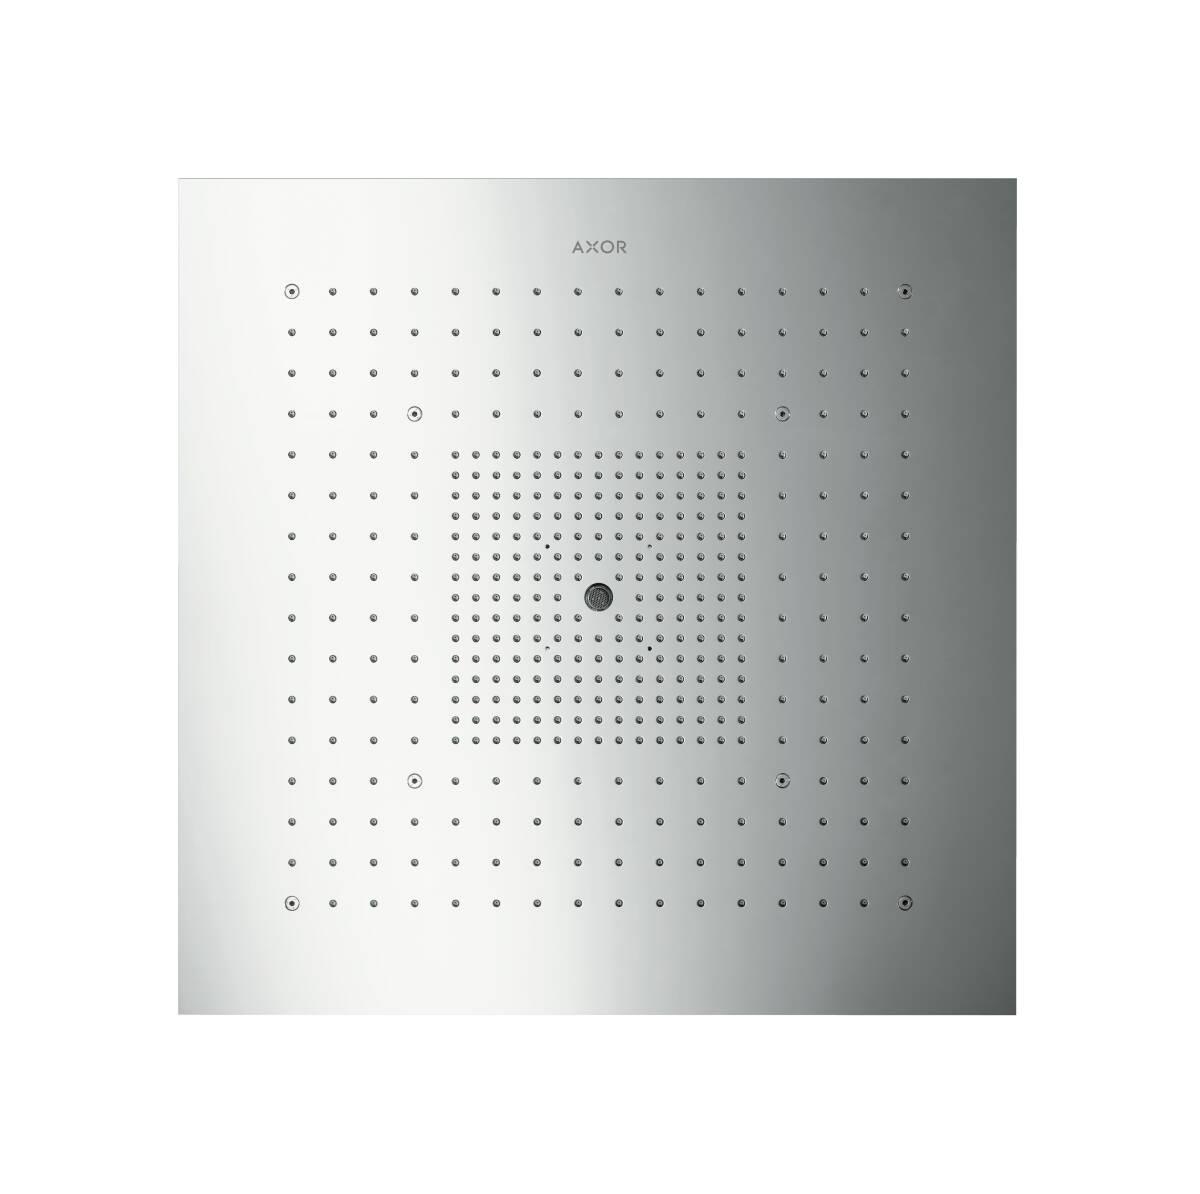 ShowerHeaven 720/720 3jet ohne Beleuchtung, Edelstahl, 10625800